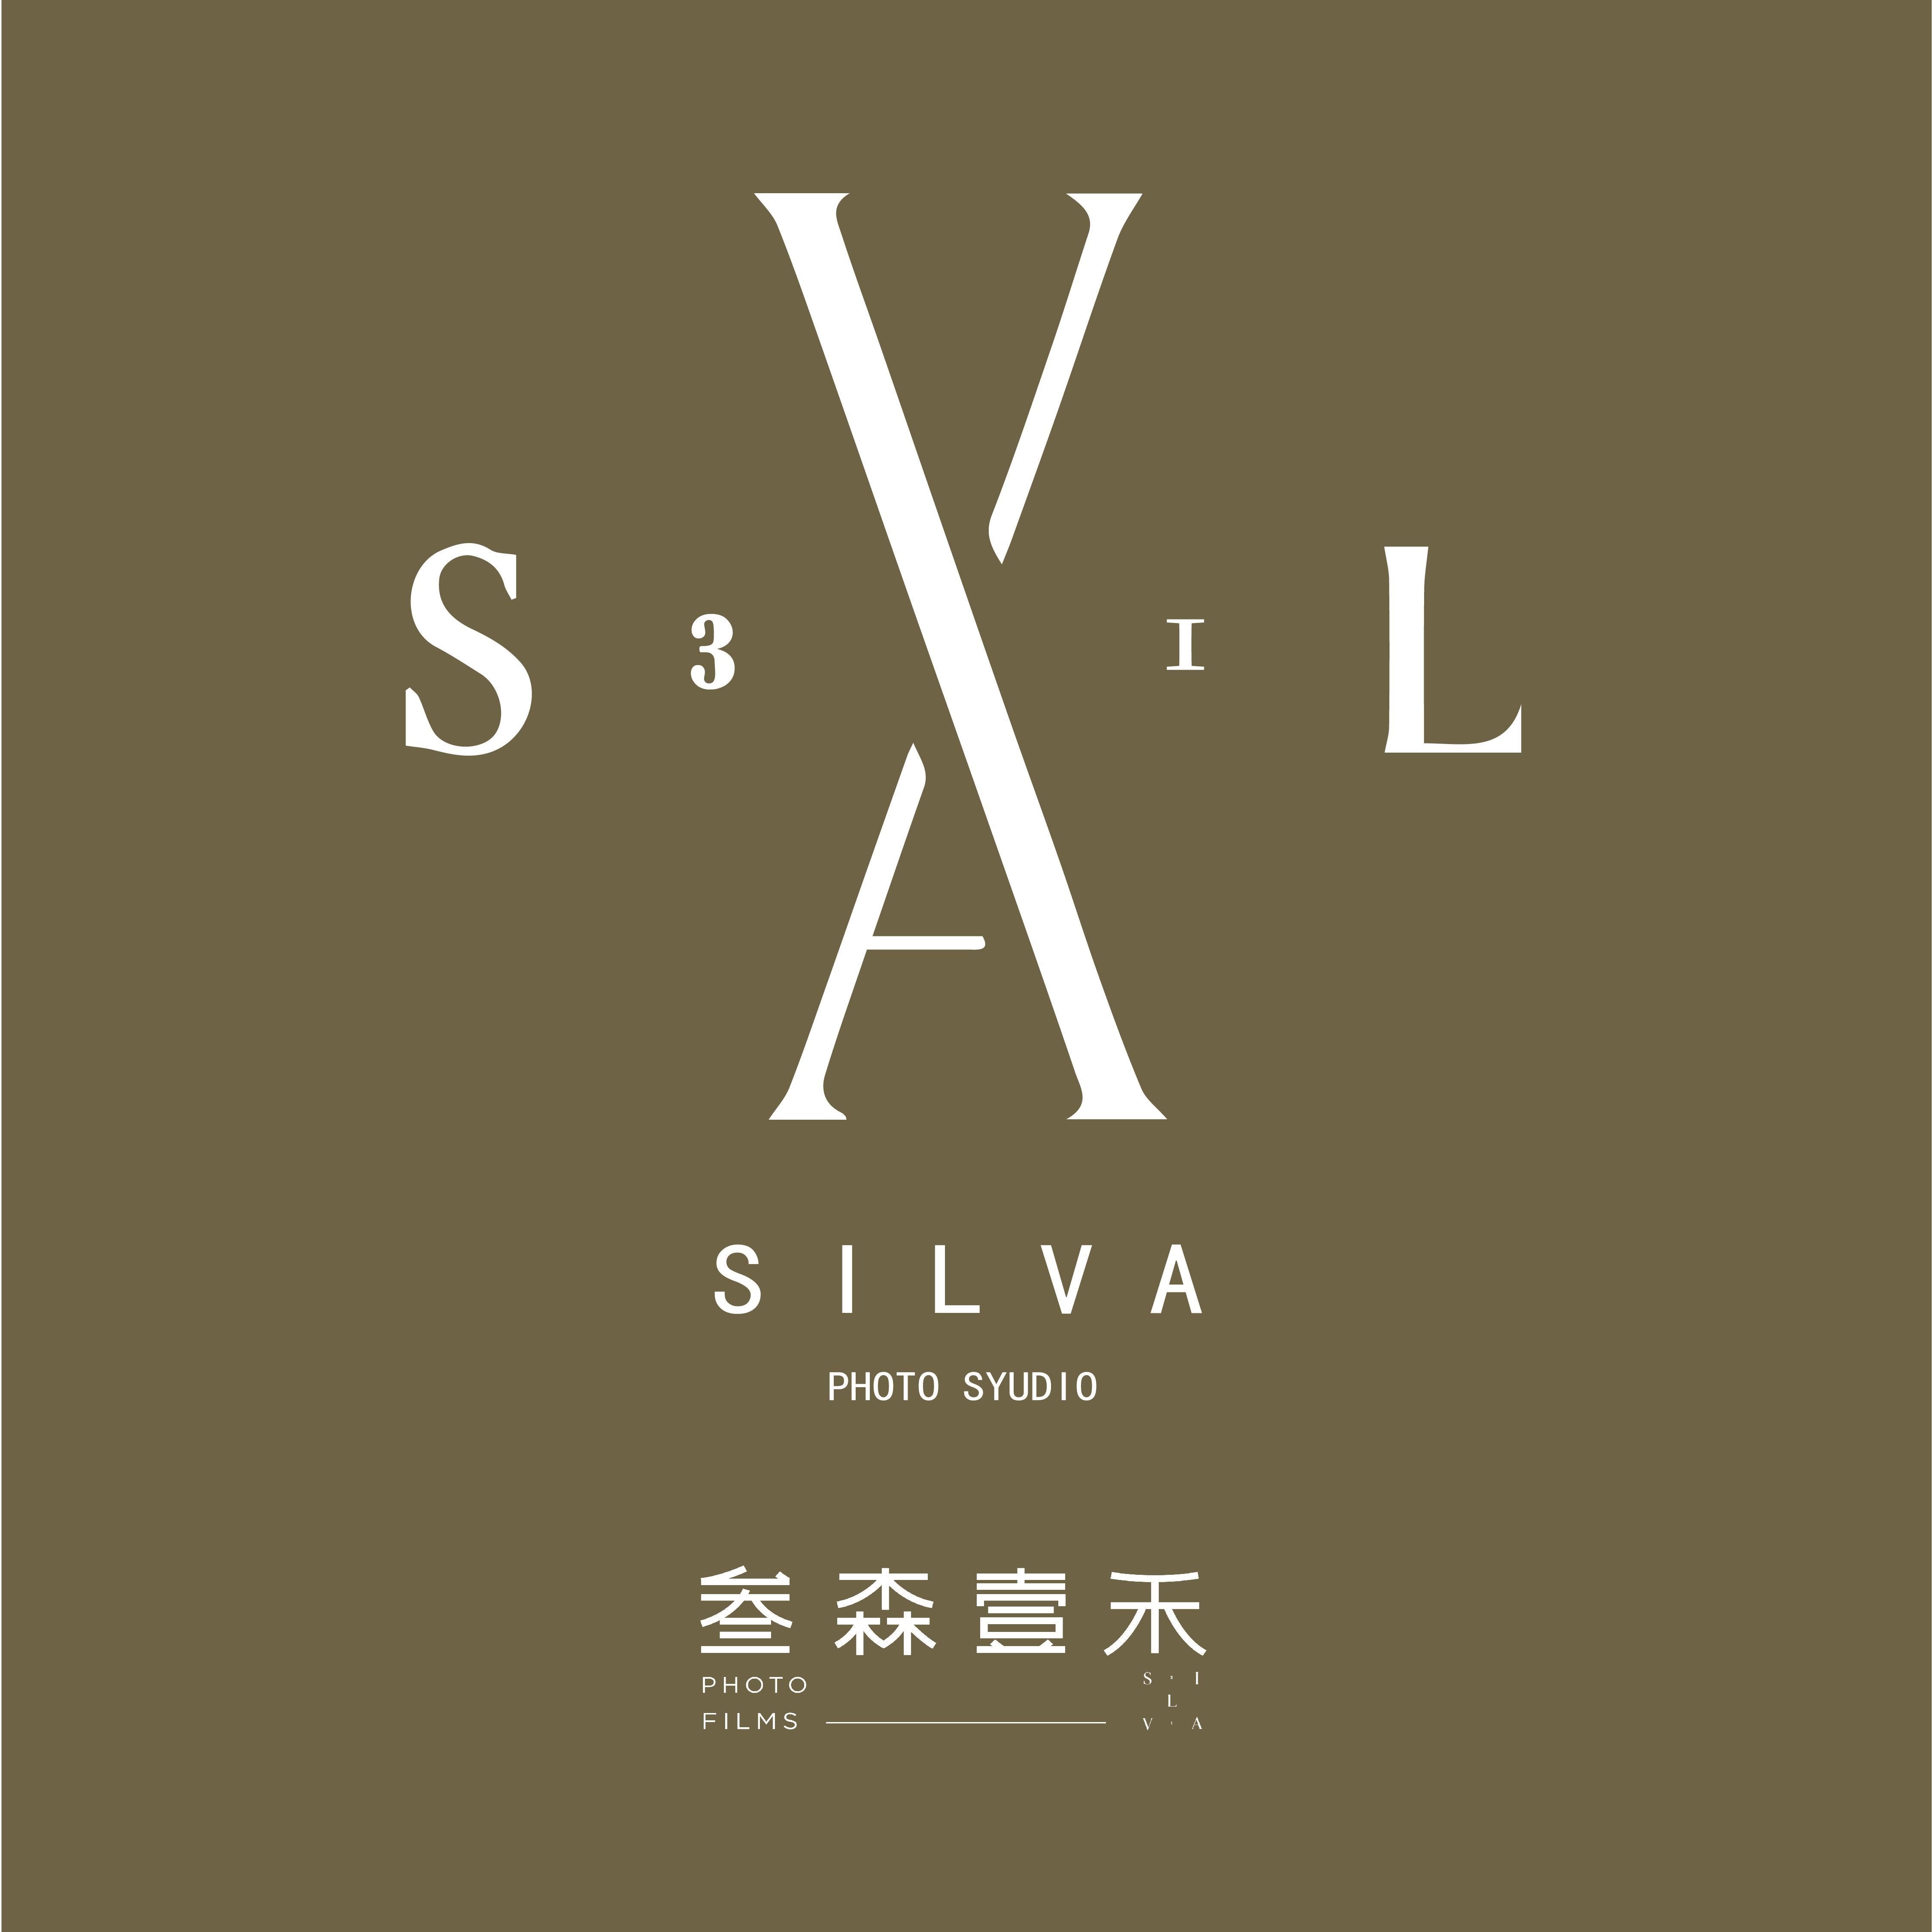 叁森壹禾SILVA STUDIO